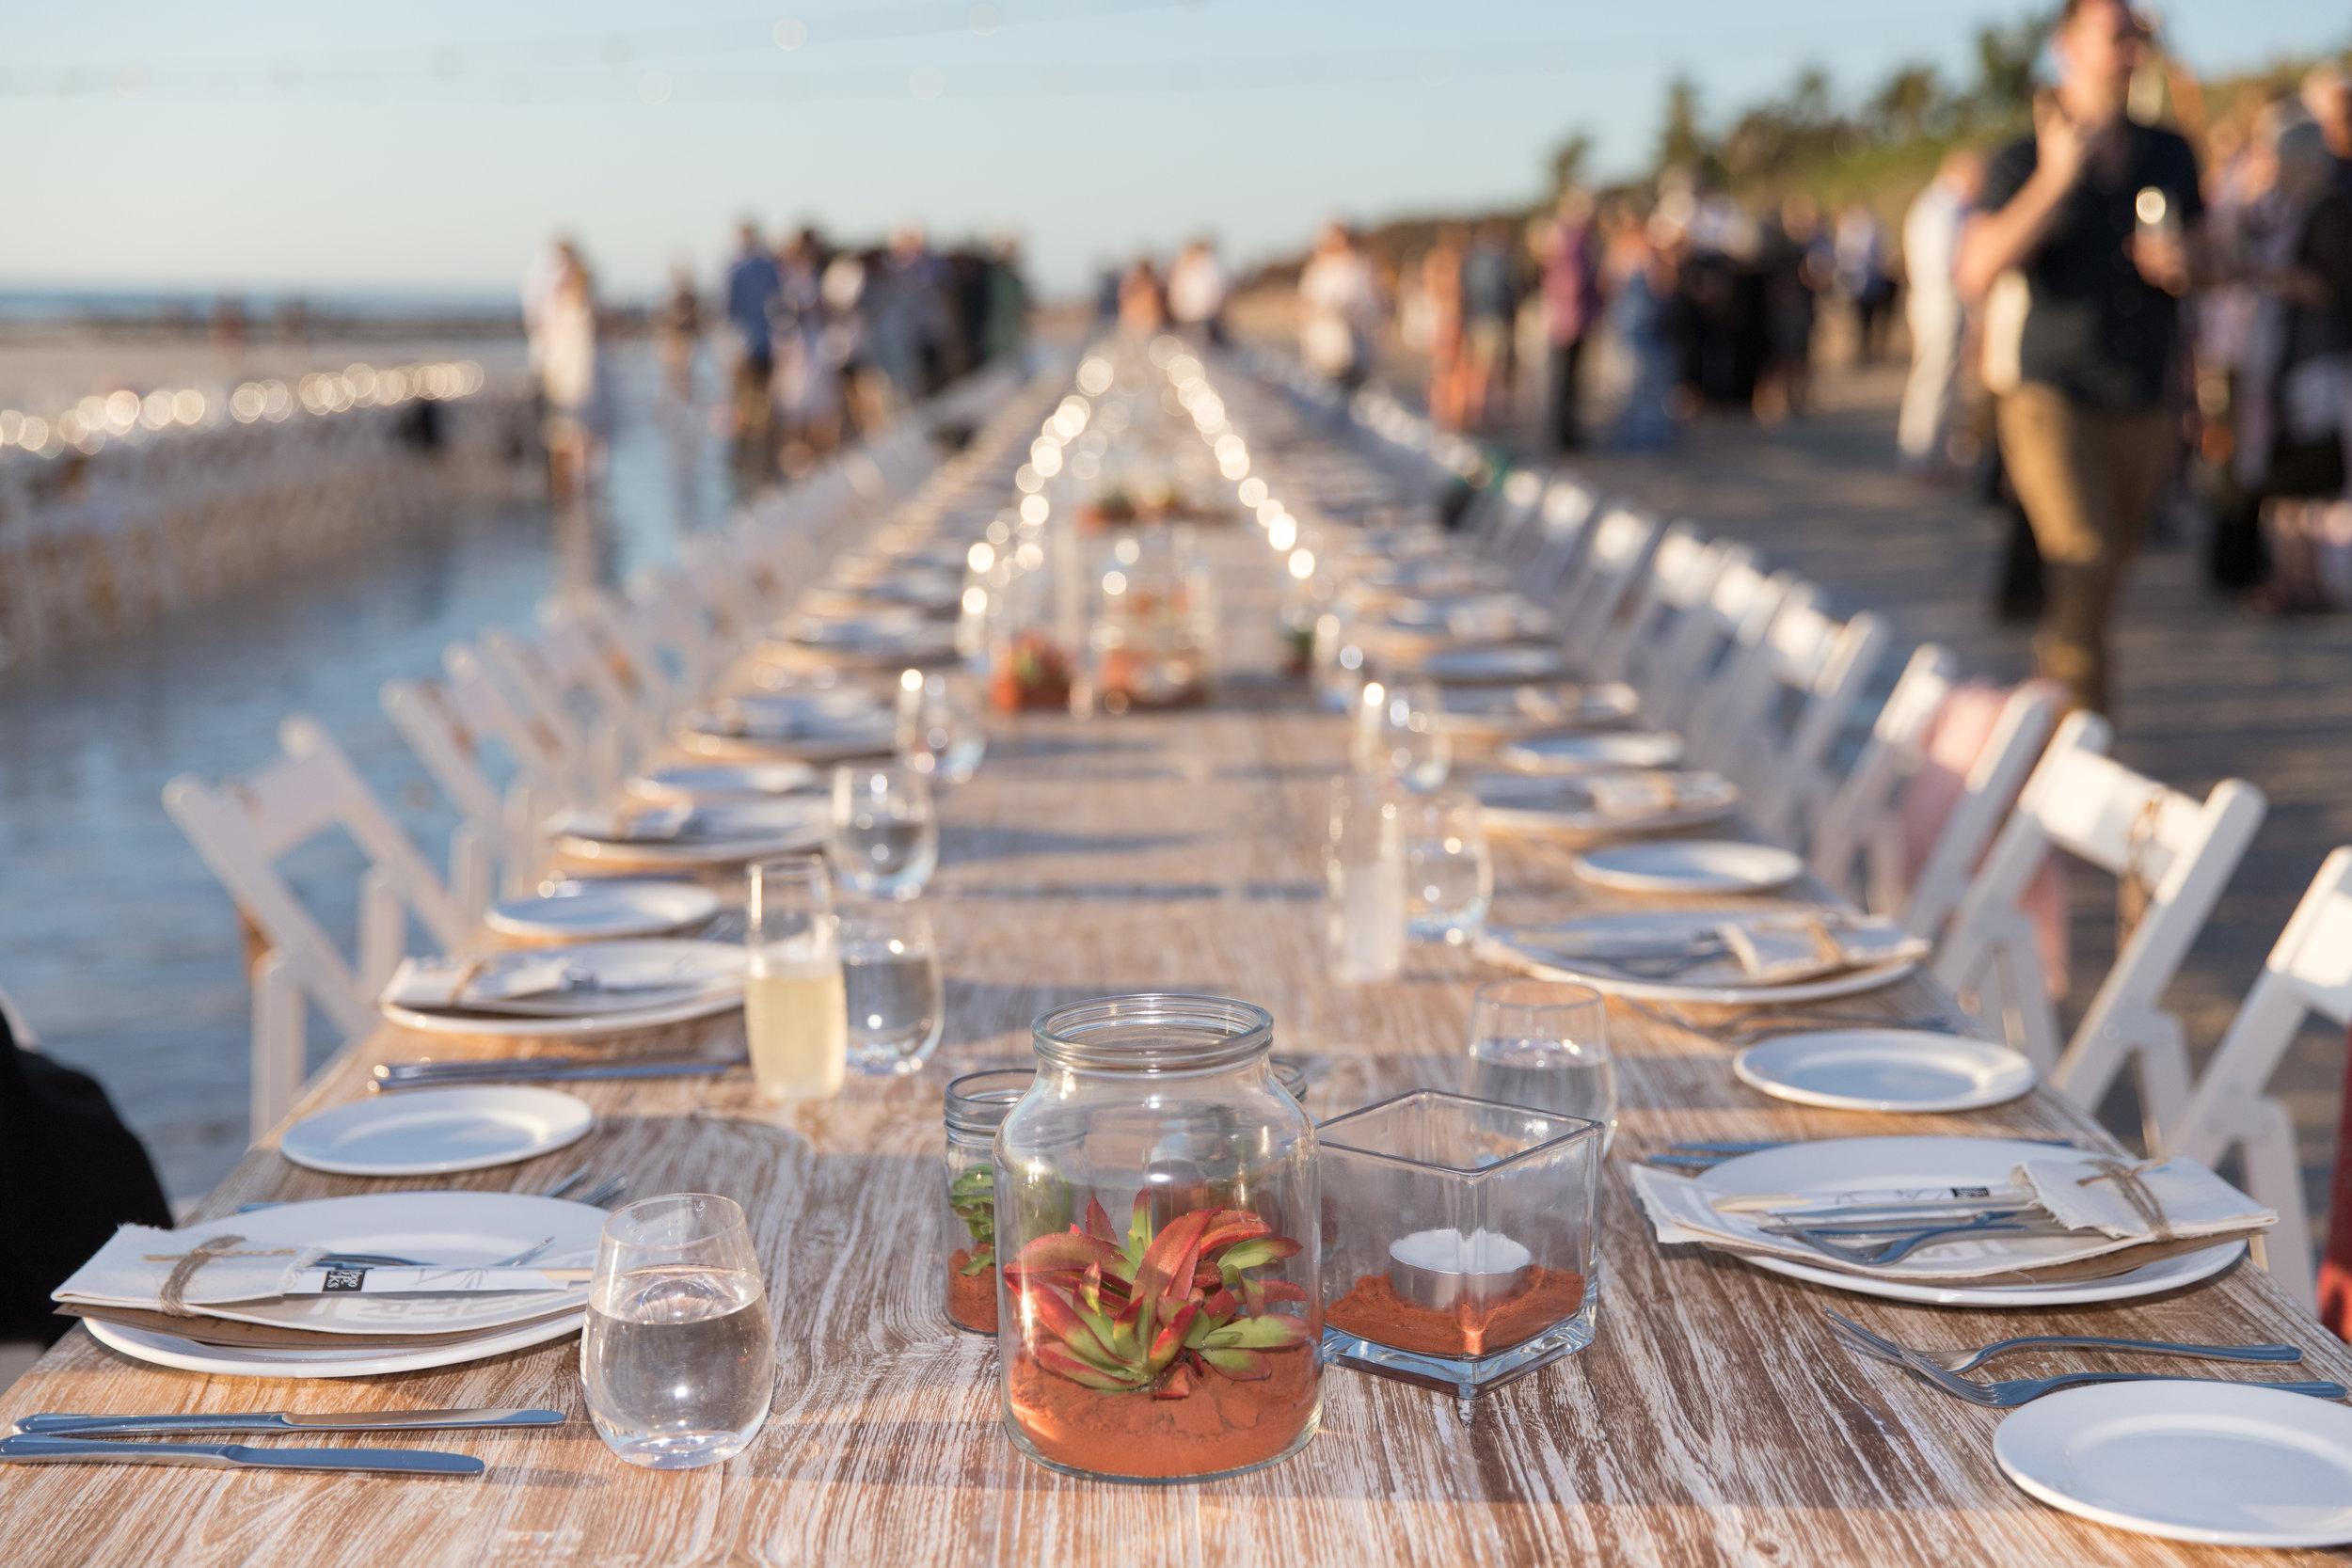 The Sunset Long Table Dinner on Cable Beach Photo: Pamela Jennings